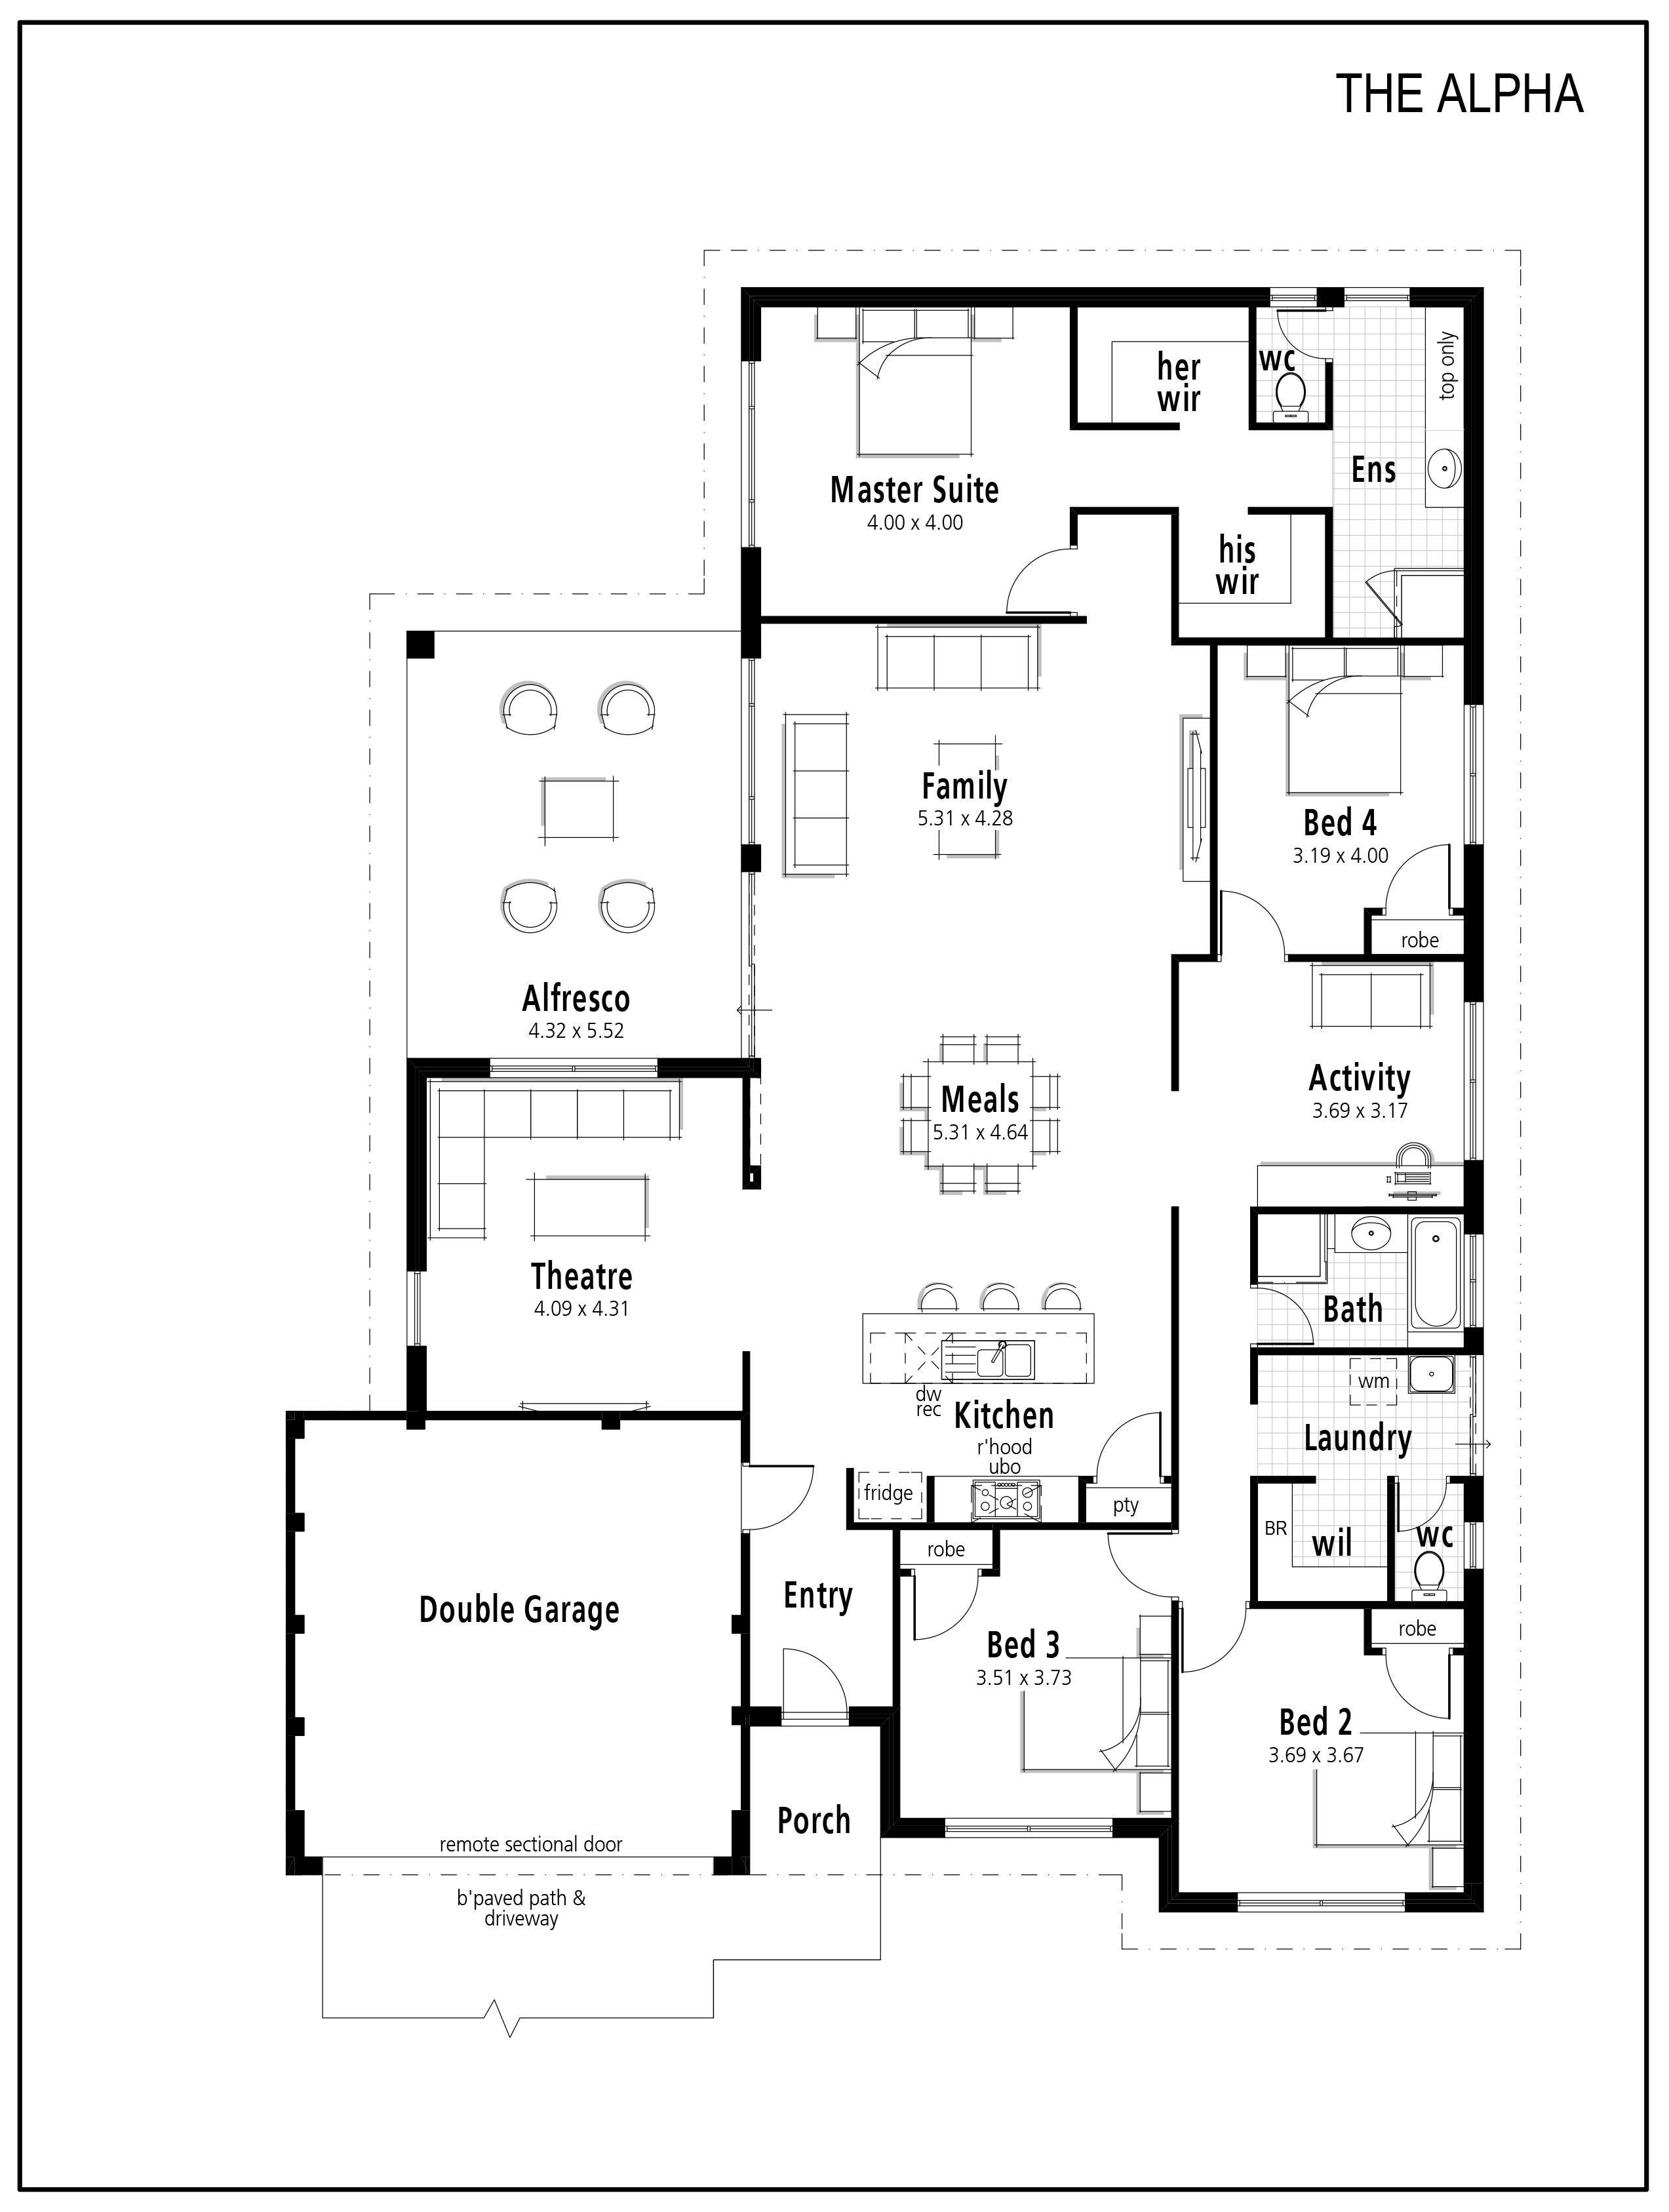 Smart Homes For Living Idesign Floor Plans Bedroom House Plans House Blueprints